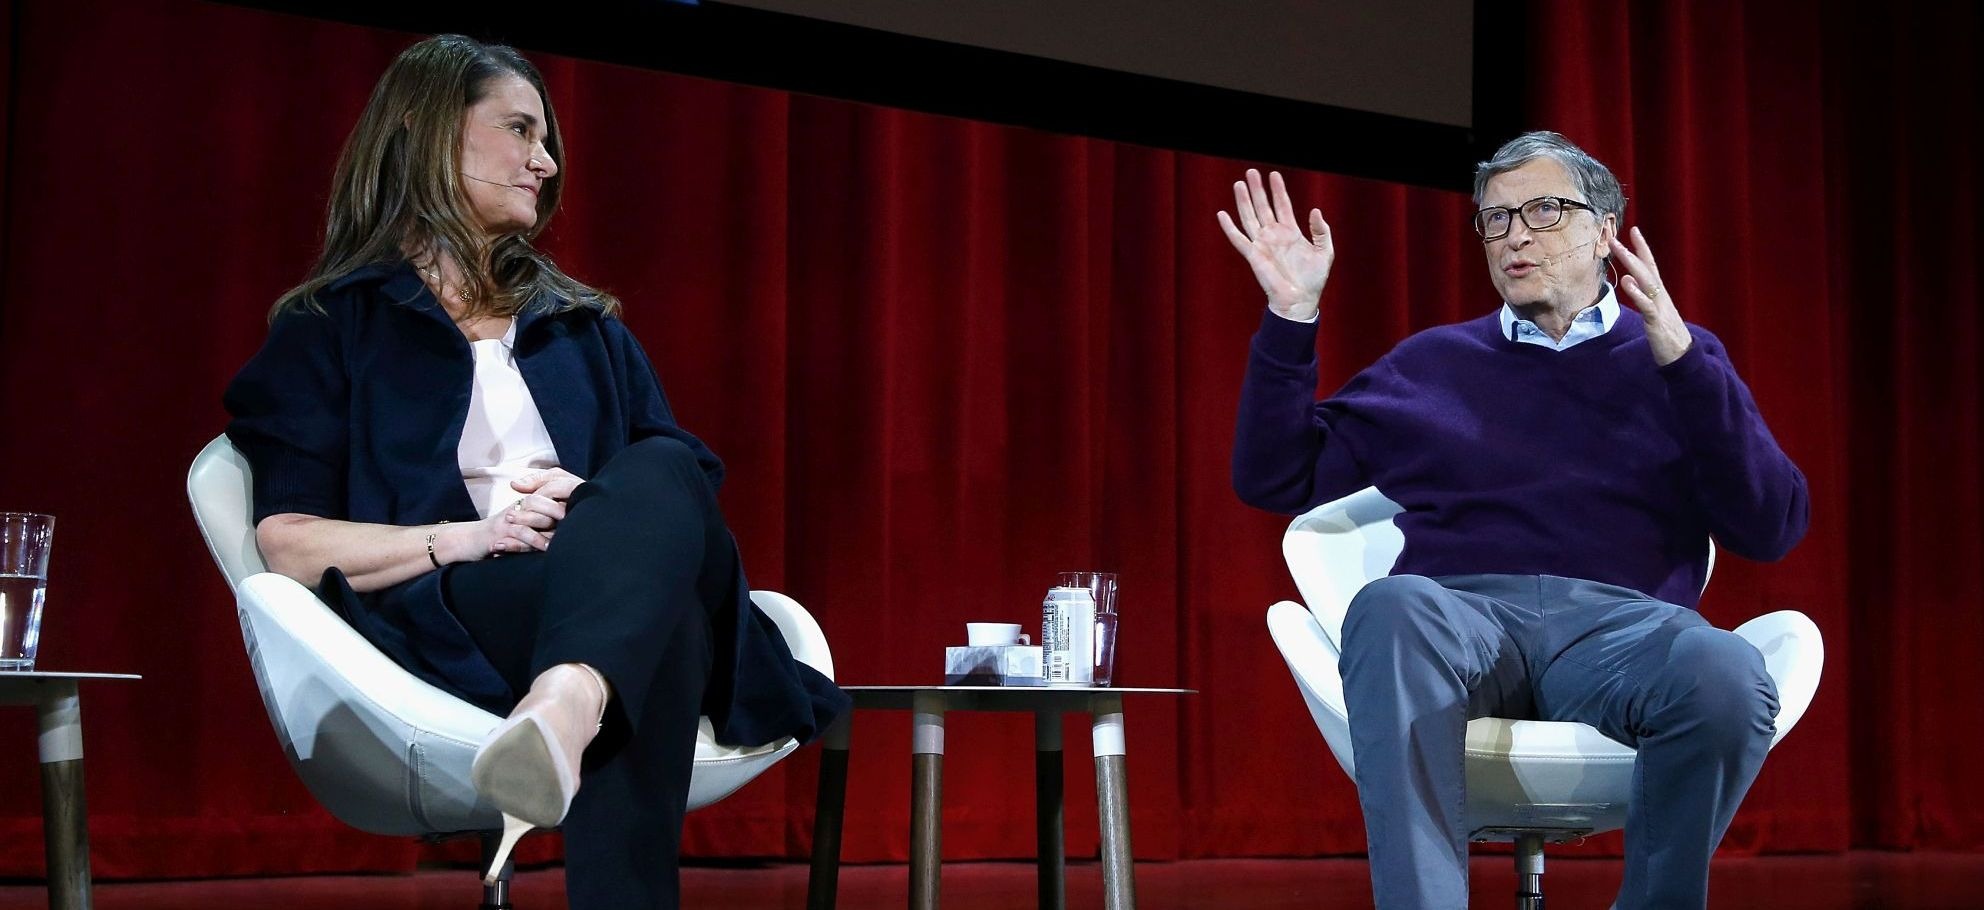 Lin-Manuel Miranda In Conversation With Bill and Melinda Gates